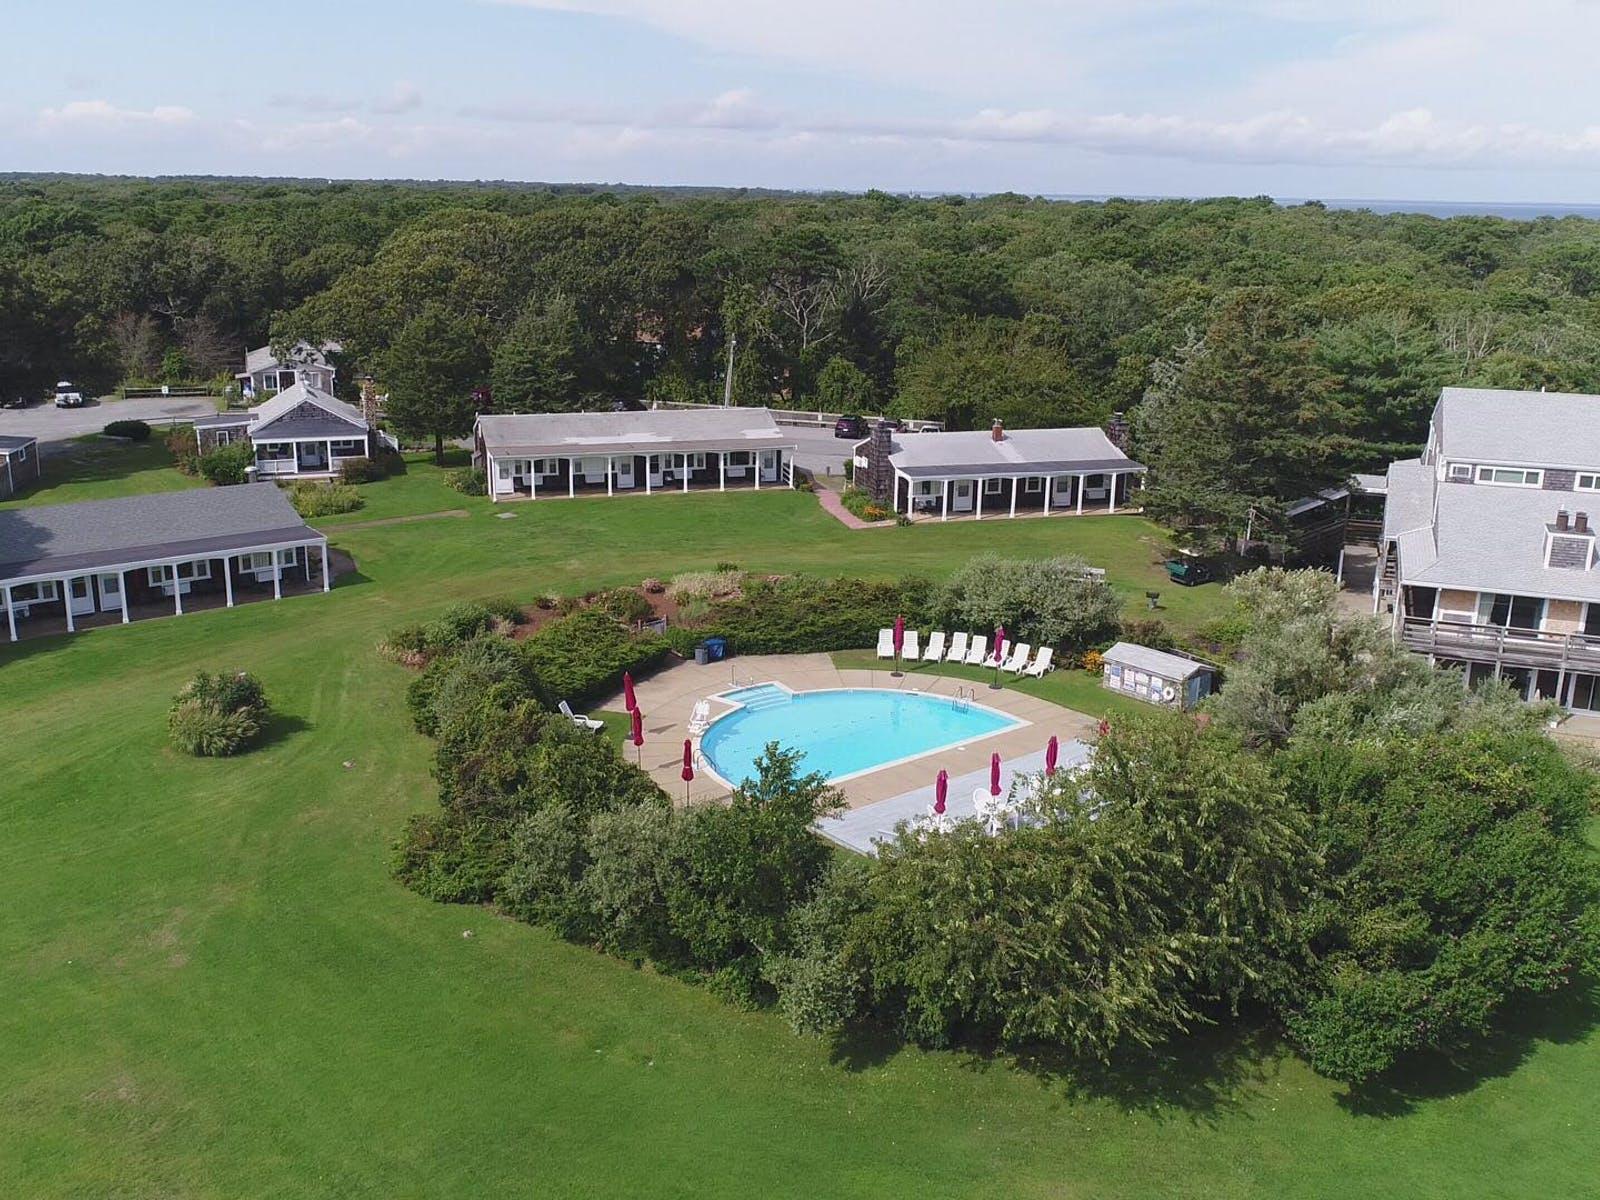 Marthas Vineyard MA wedding rentals with outdoor pool